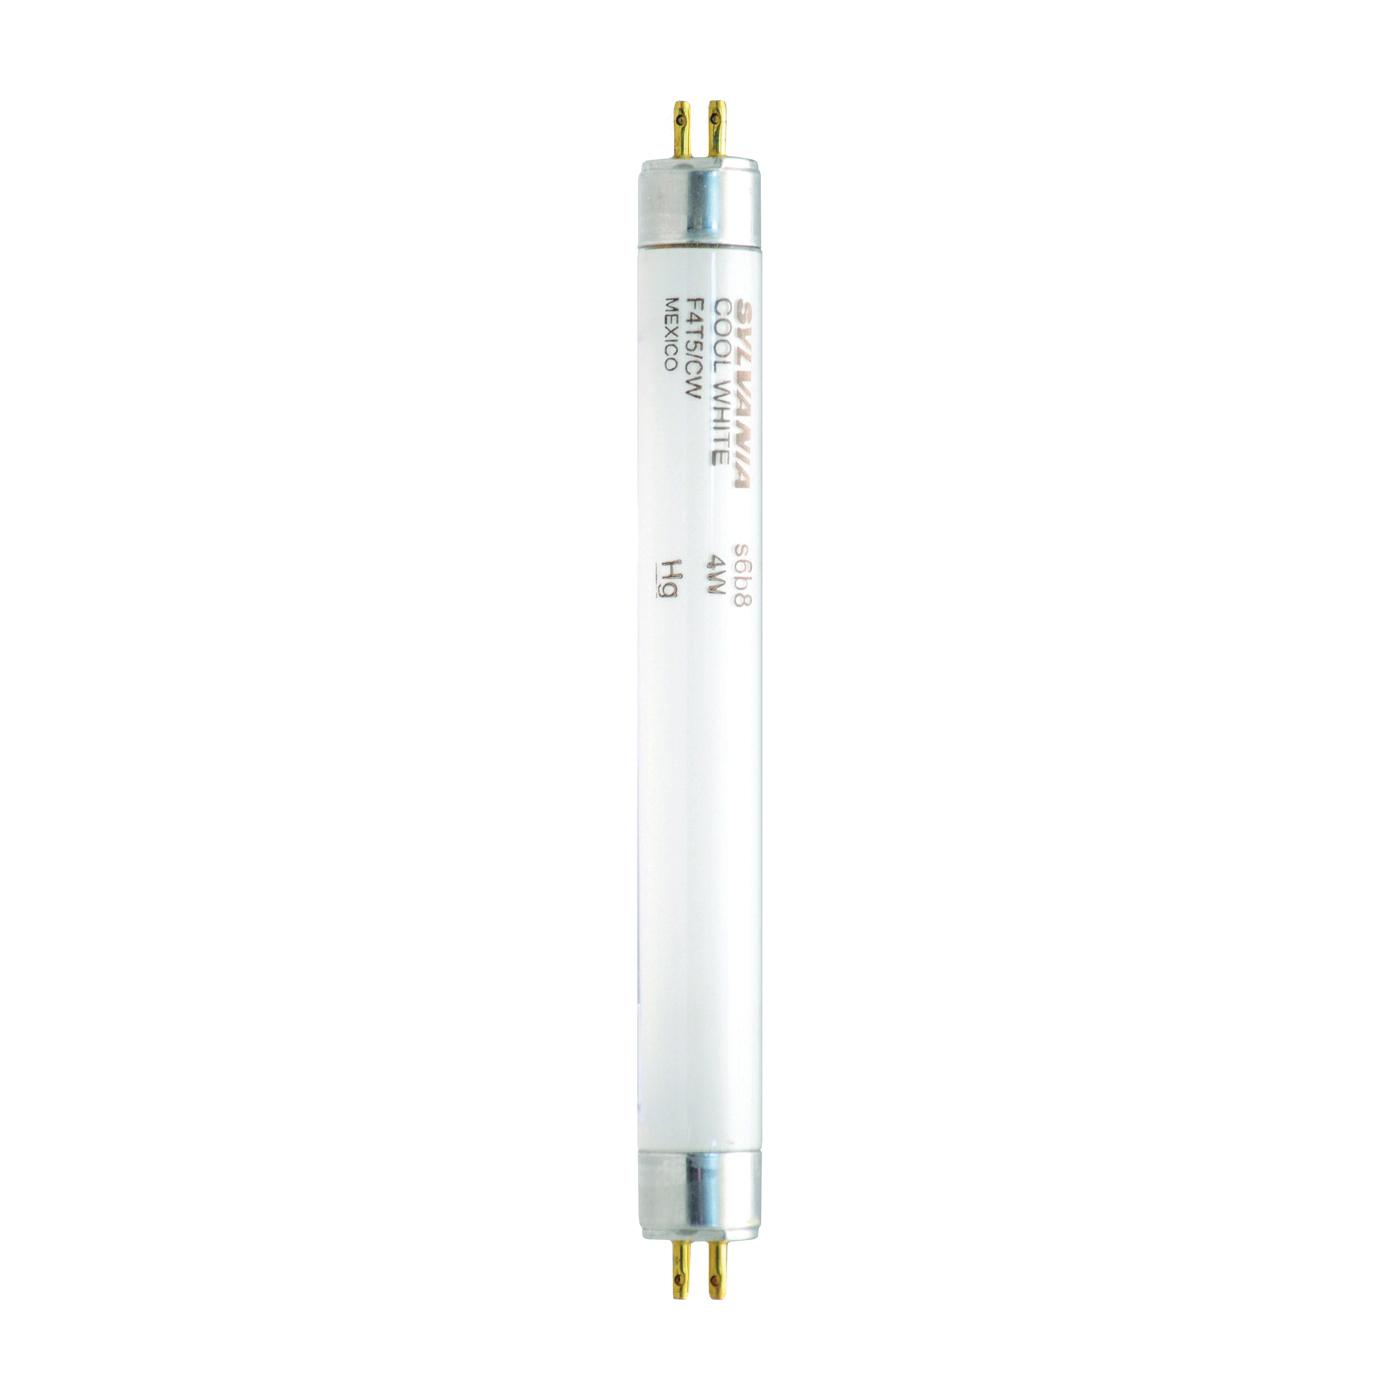 Picture of Sylvania 20415 Fluorescent Lamp, 4 W, T5 Lamp, Miniature G5 Lamp Base, 140 Initial Lumens, 4200 K Color Temp